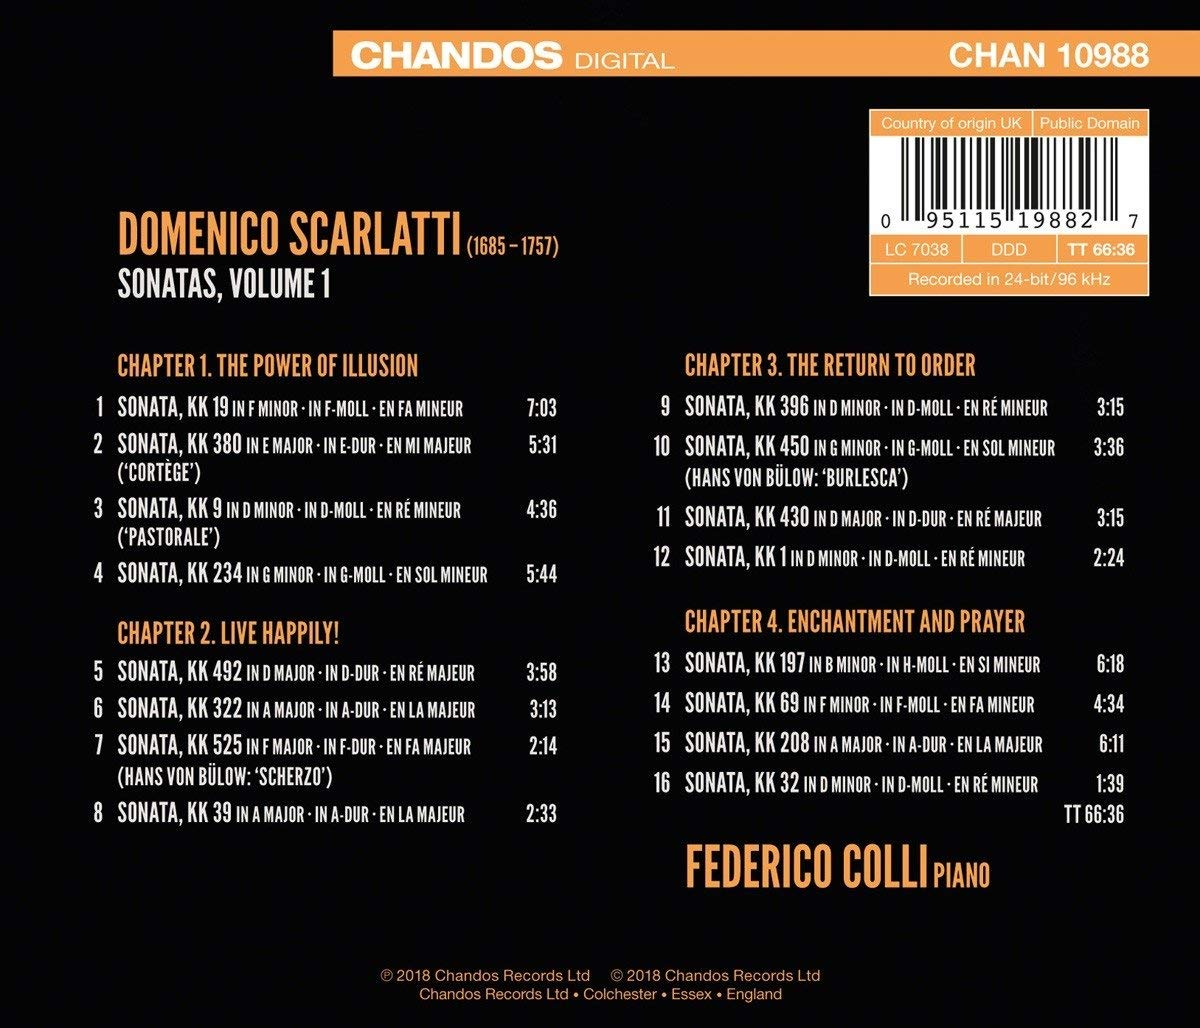 Domenico Scarlatti: discographie sélective - Page 5 711hsz10